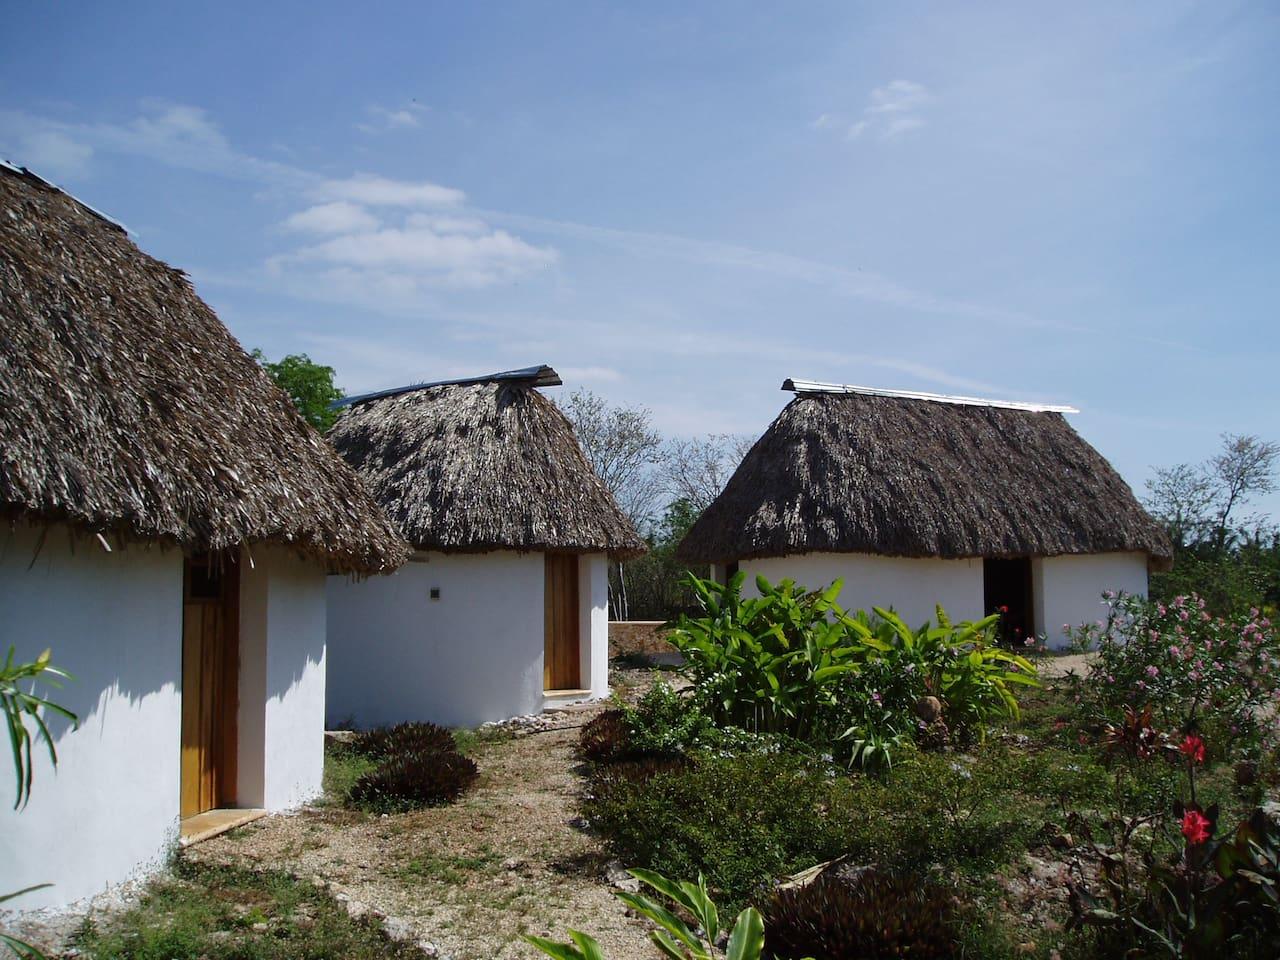 three mayan-style palapas